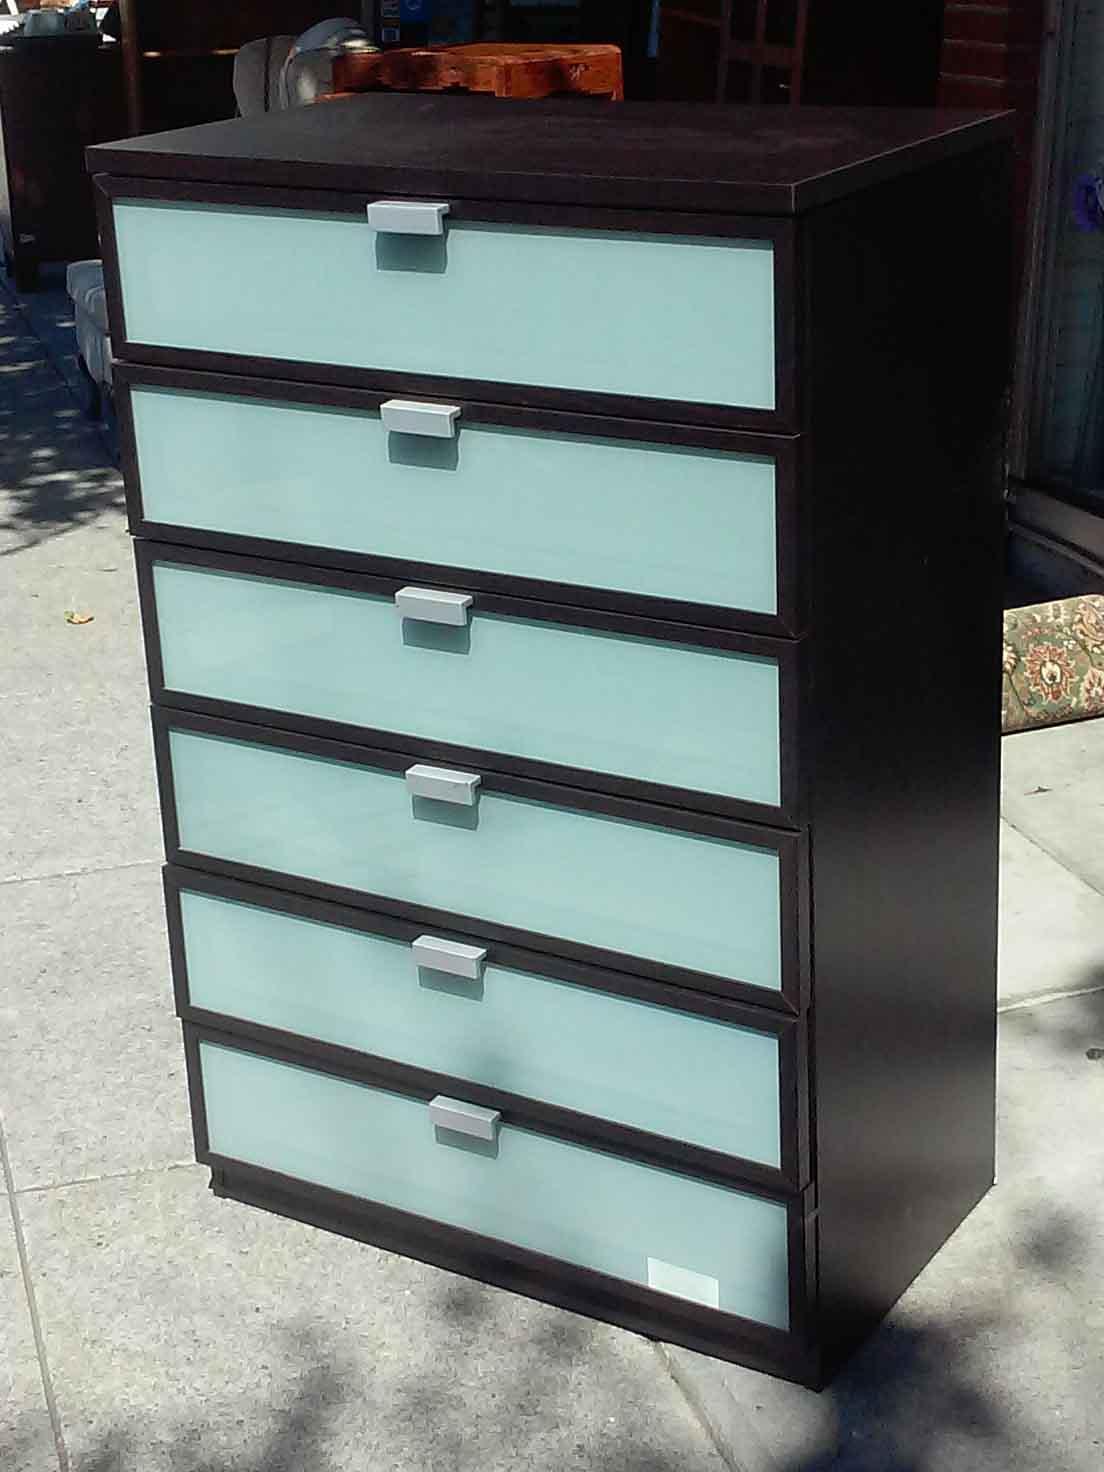 Uhuru Furniture Collectibles Sold Ikea Hopen 6 Drawer Chest 90. Ikea Hopen 4 Drawer Dresser   Trend Dressers Designs